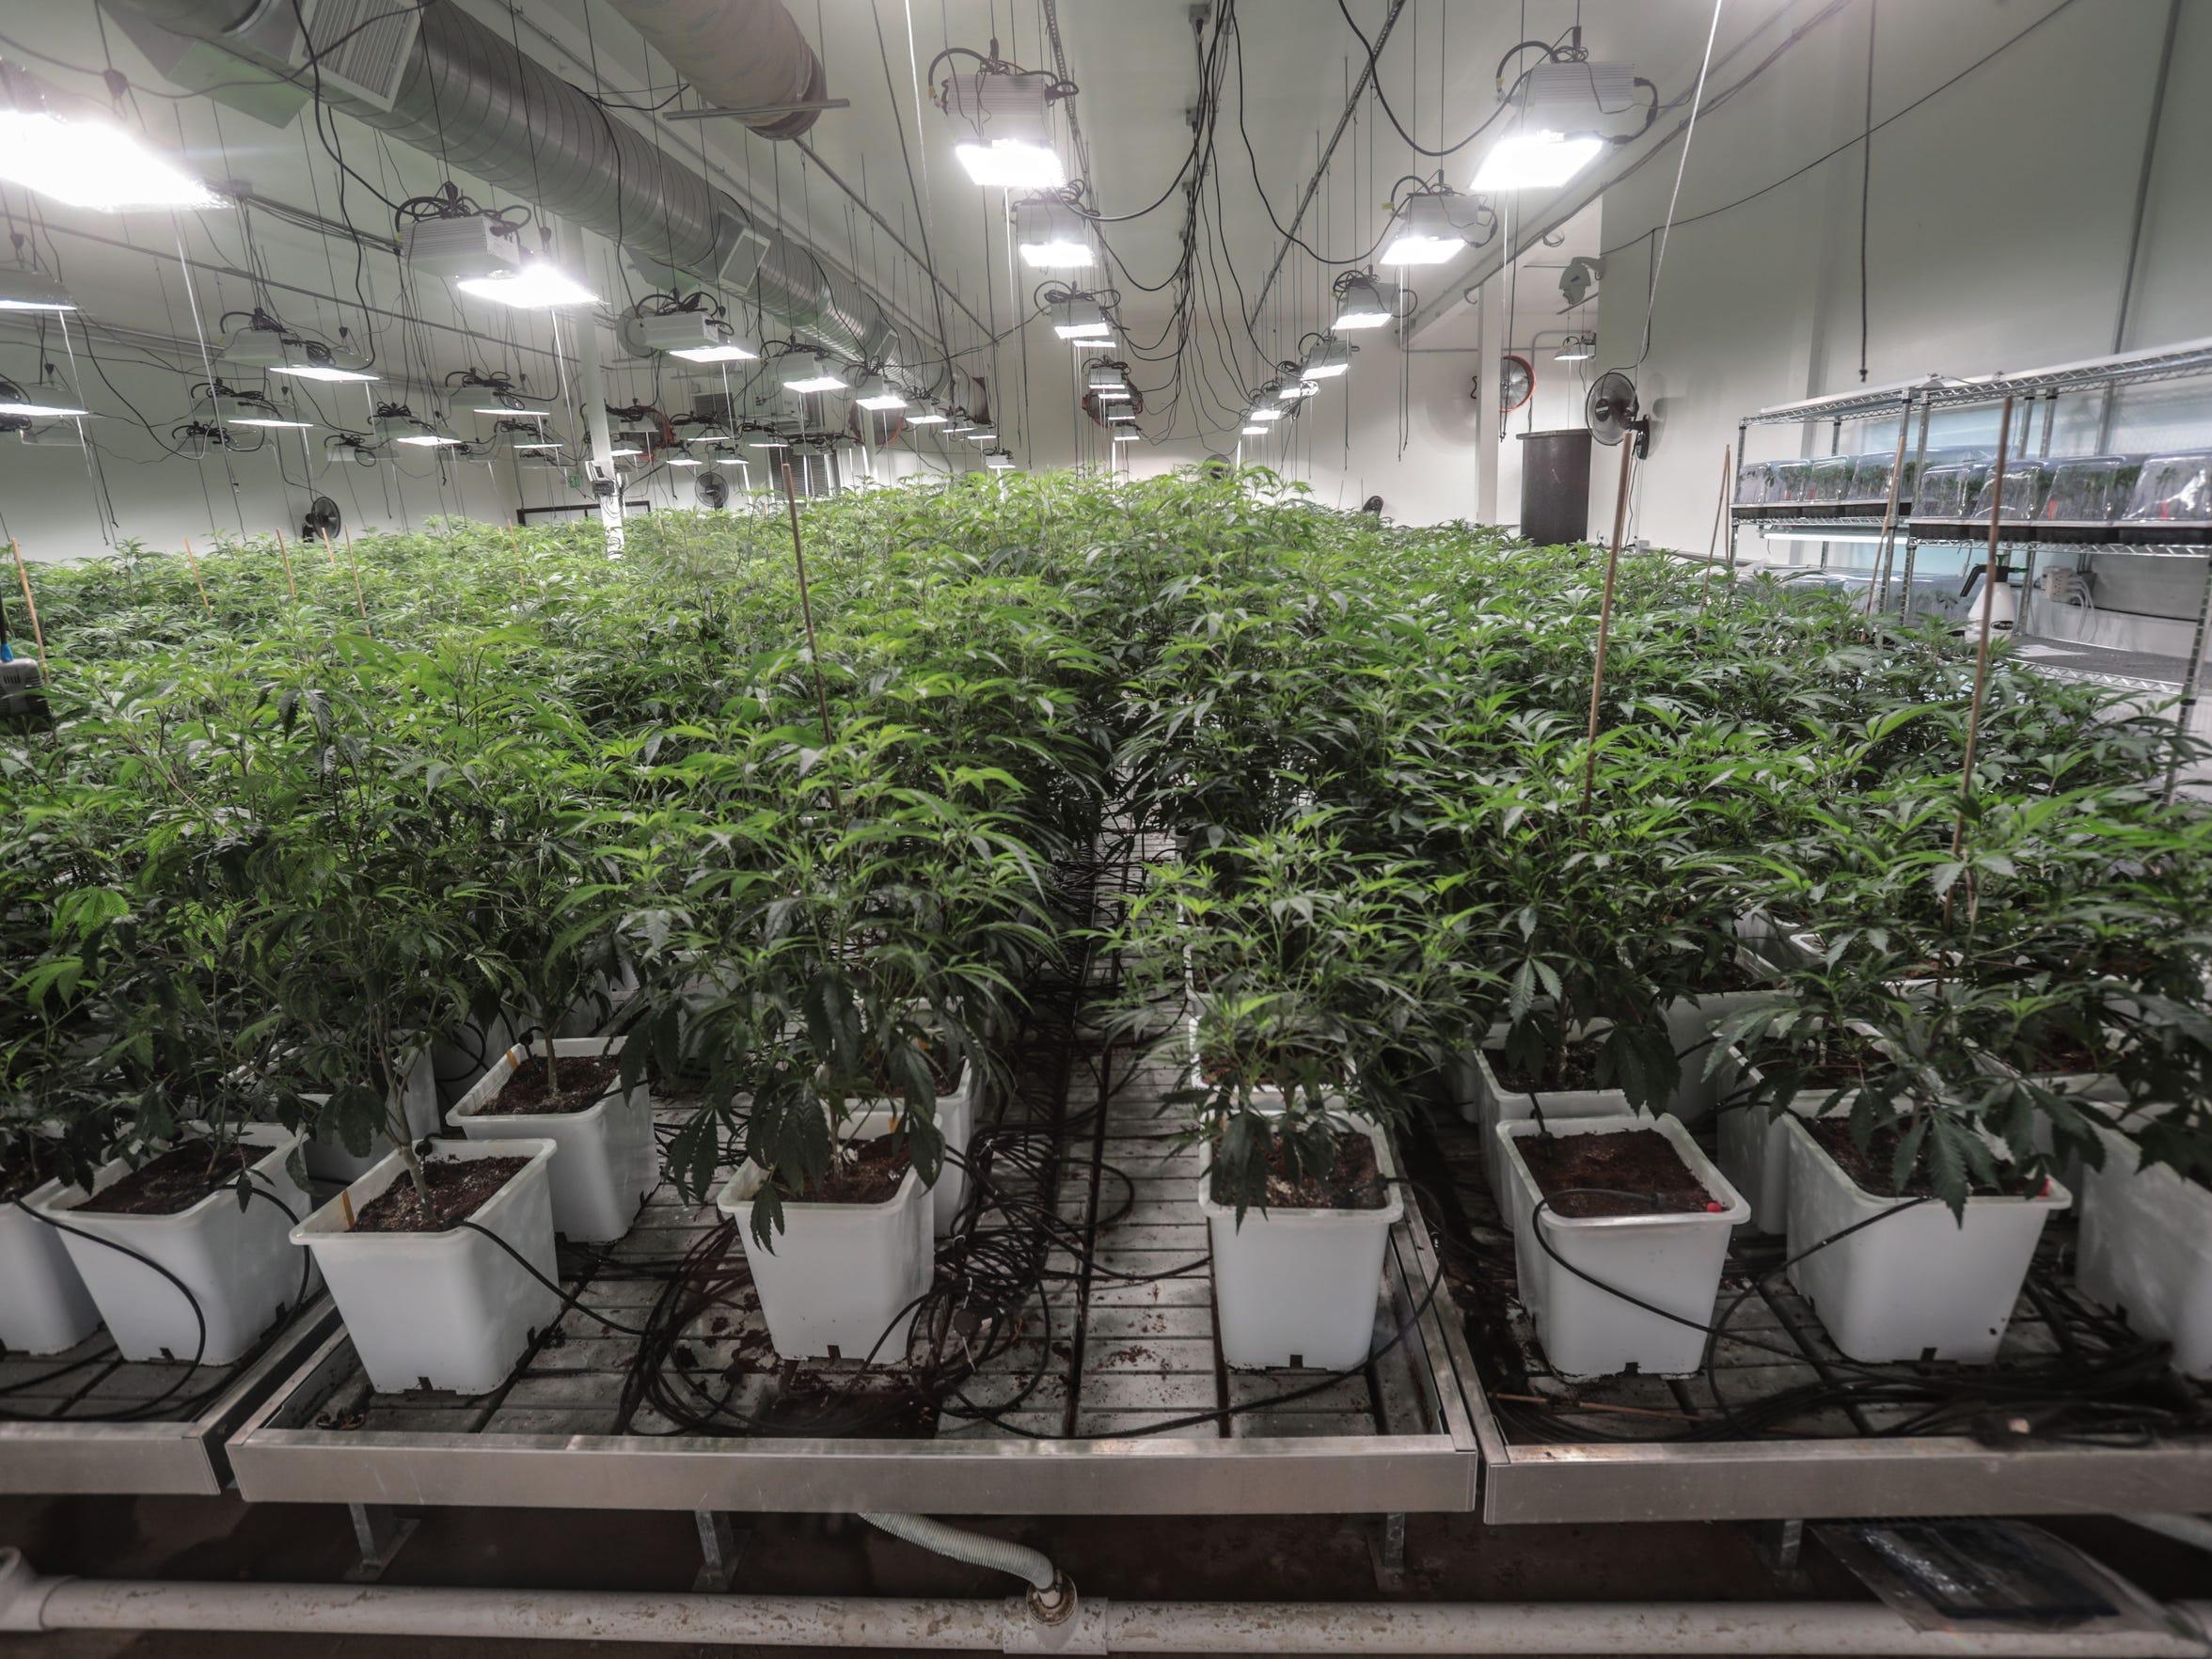 Cannabis is a grow house in Coachella on Tuesday, April 3, 2018.